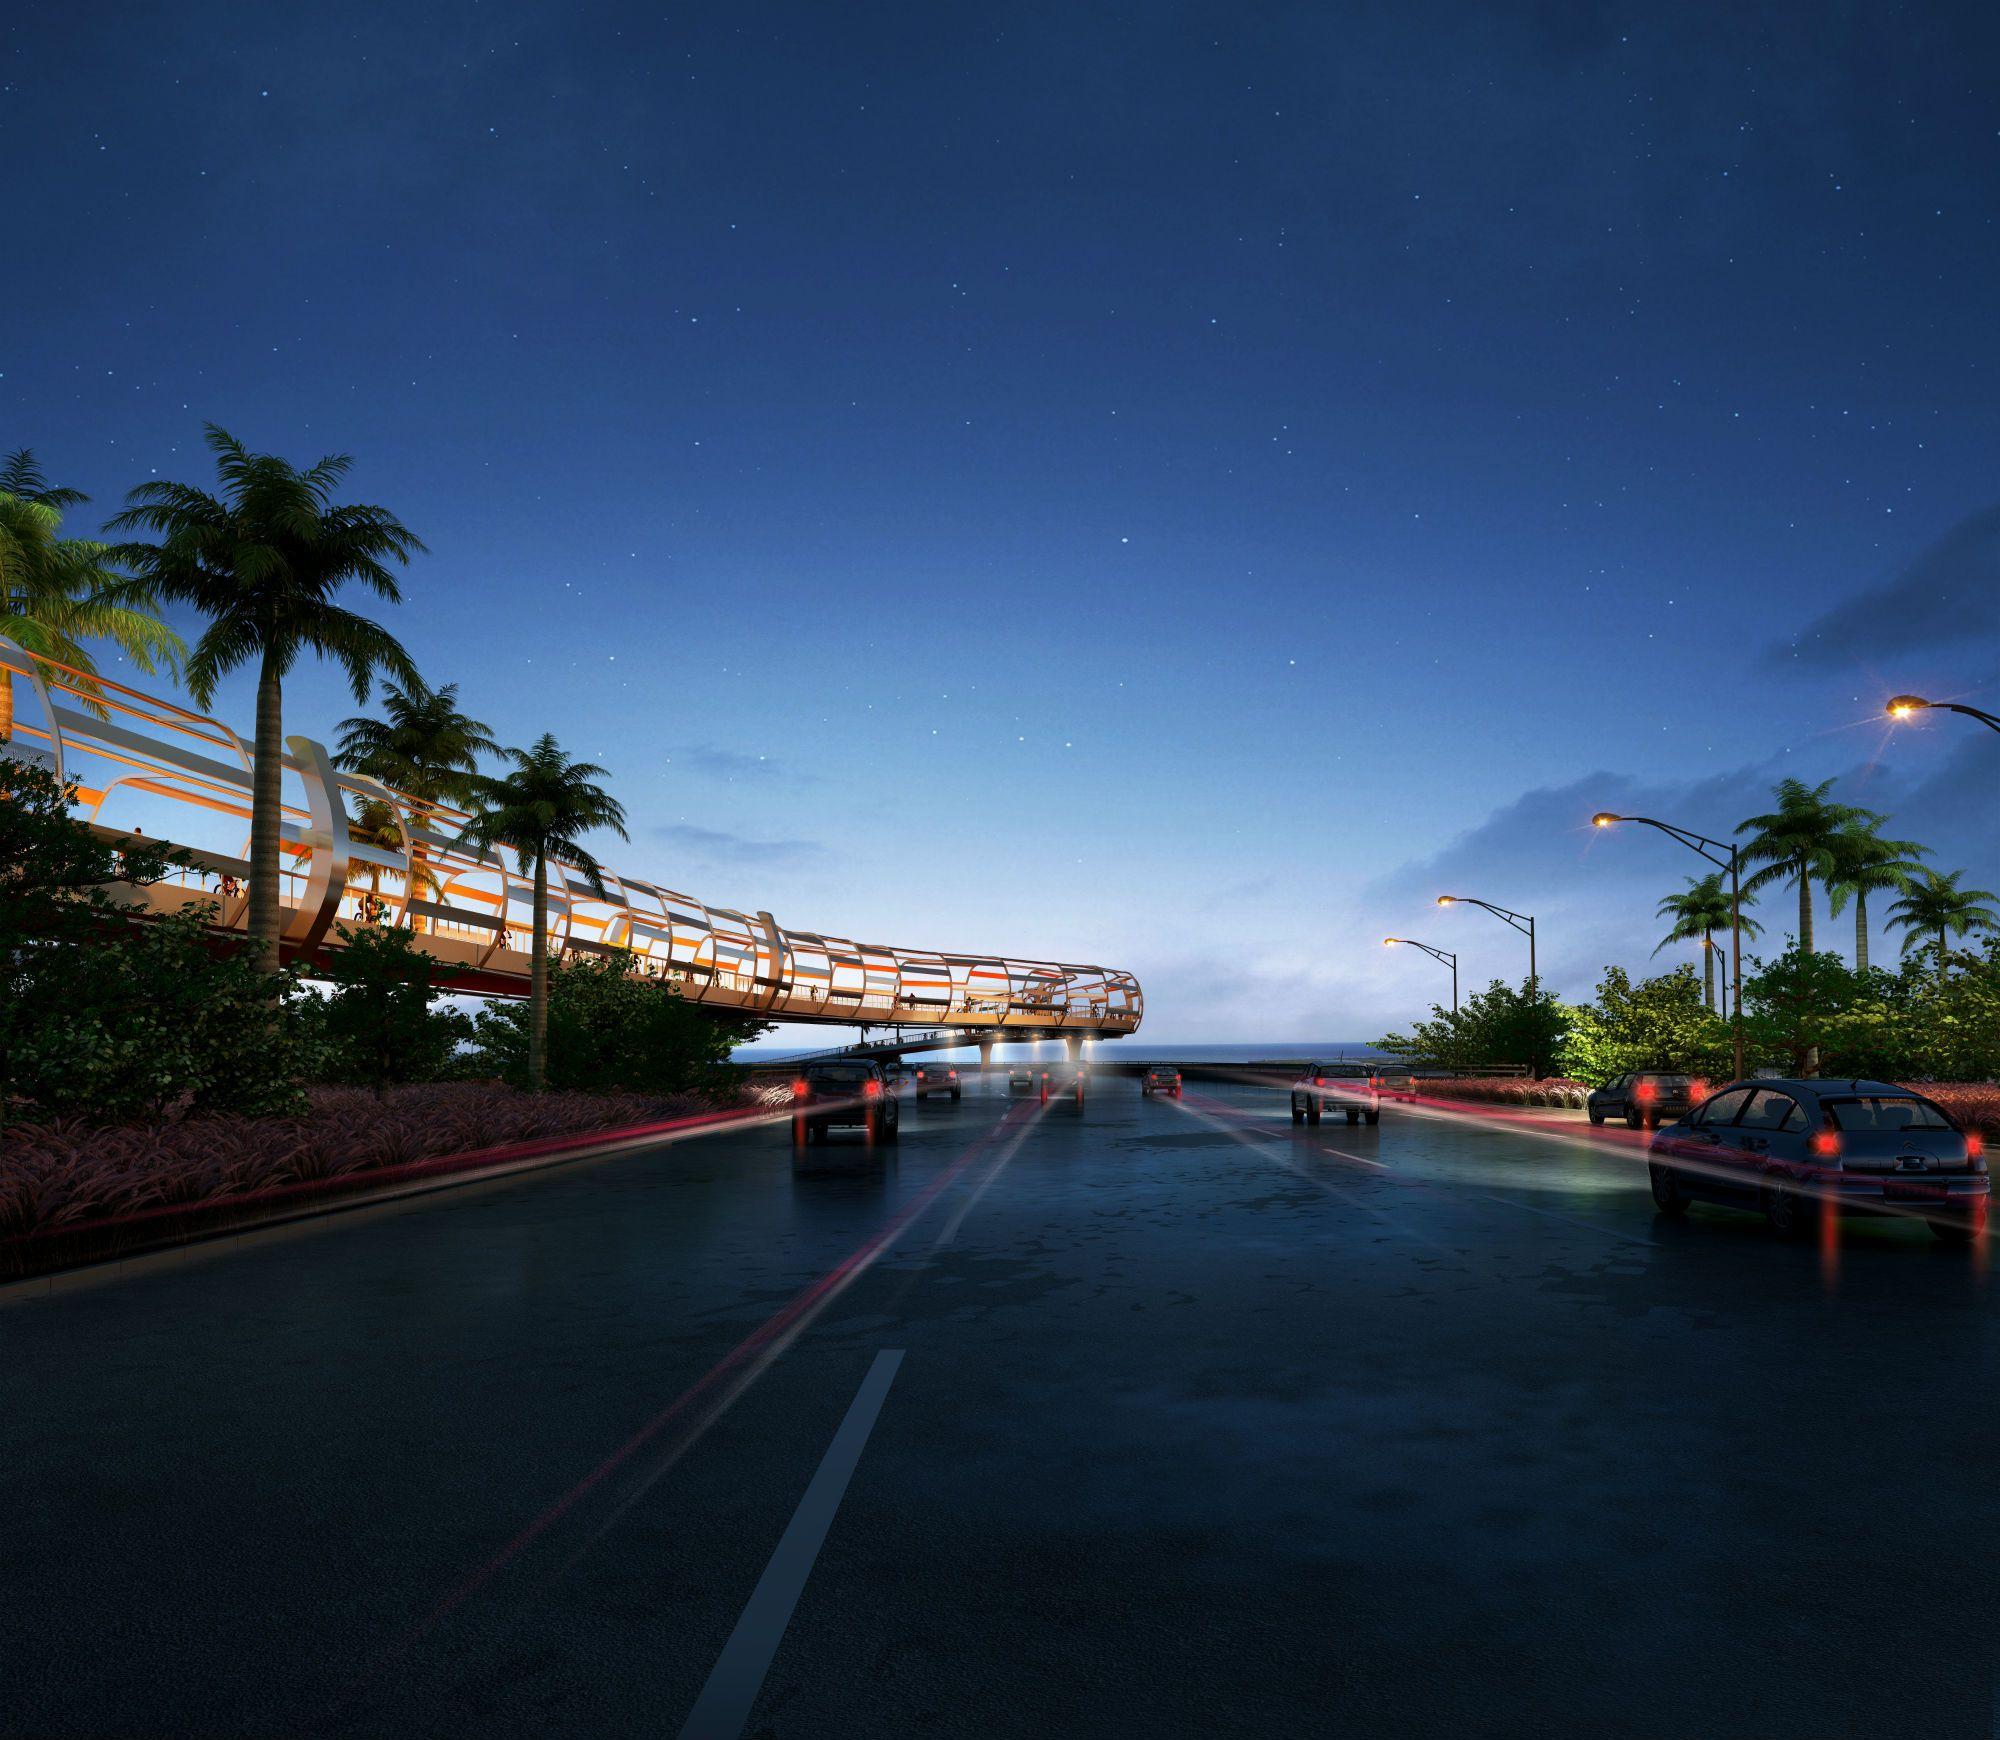 Bold Proposal For New Bike Bridge Connecting Miami To Key